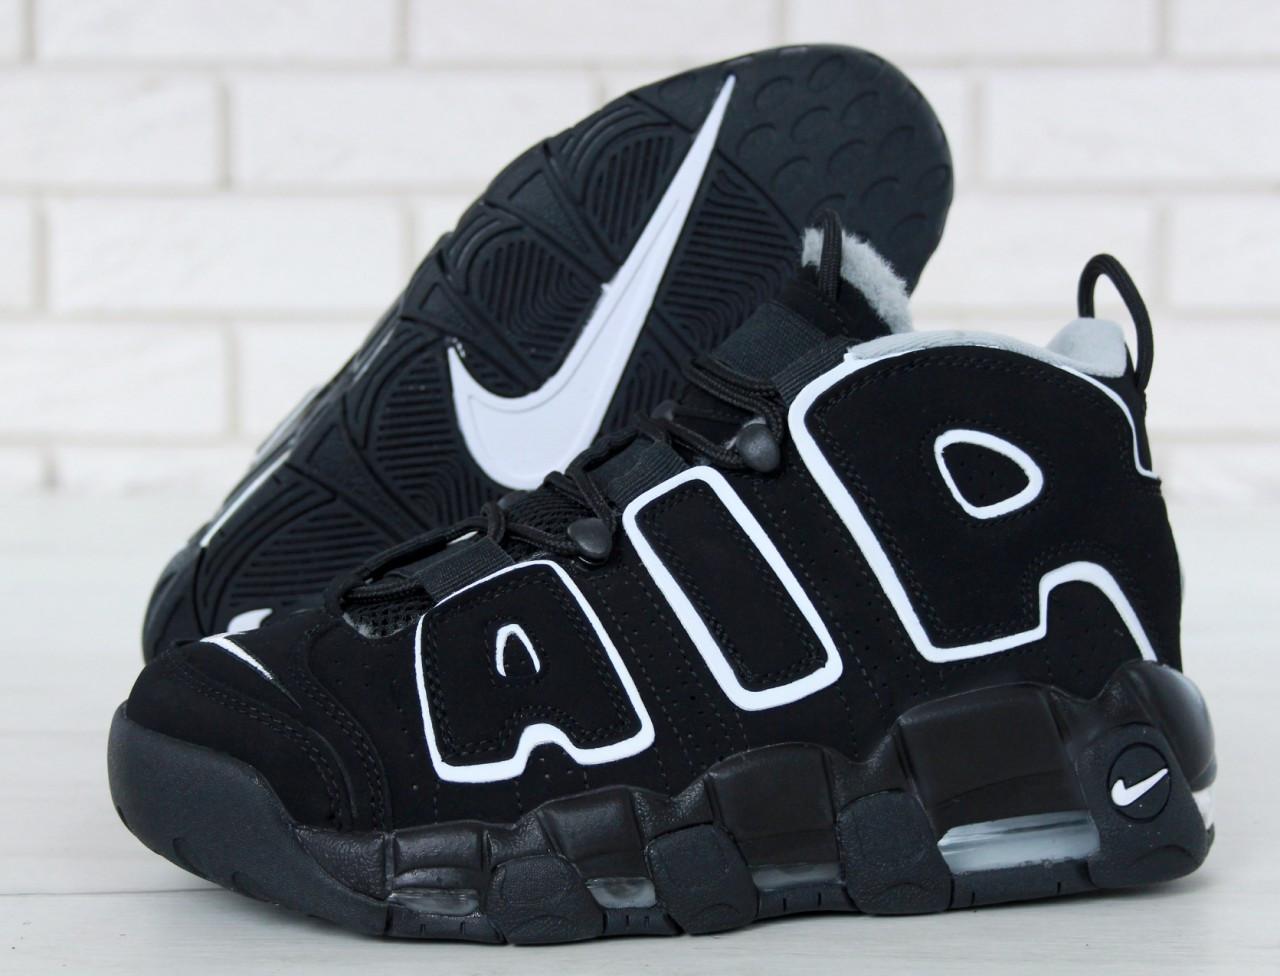 bbf30aa195f5 Мужские зимние кроссовки Nike air more uptempo black and white -  Интернет-магазин